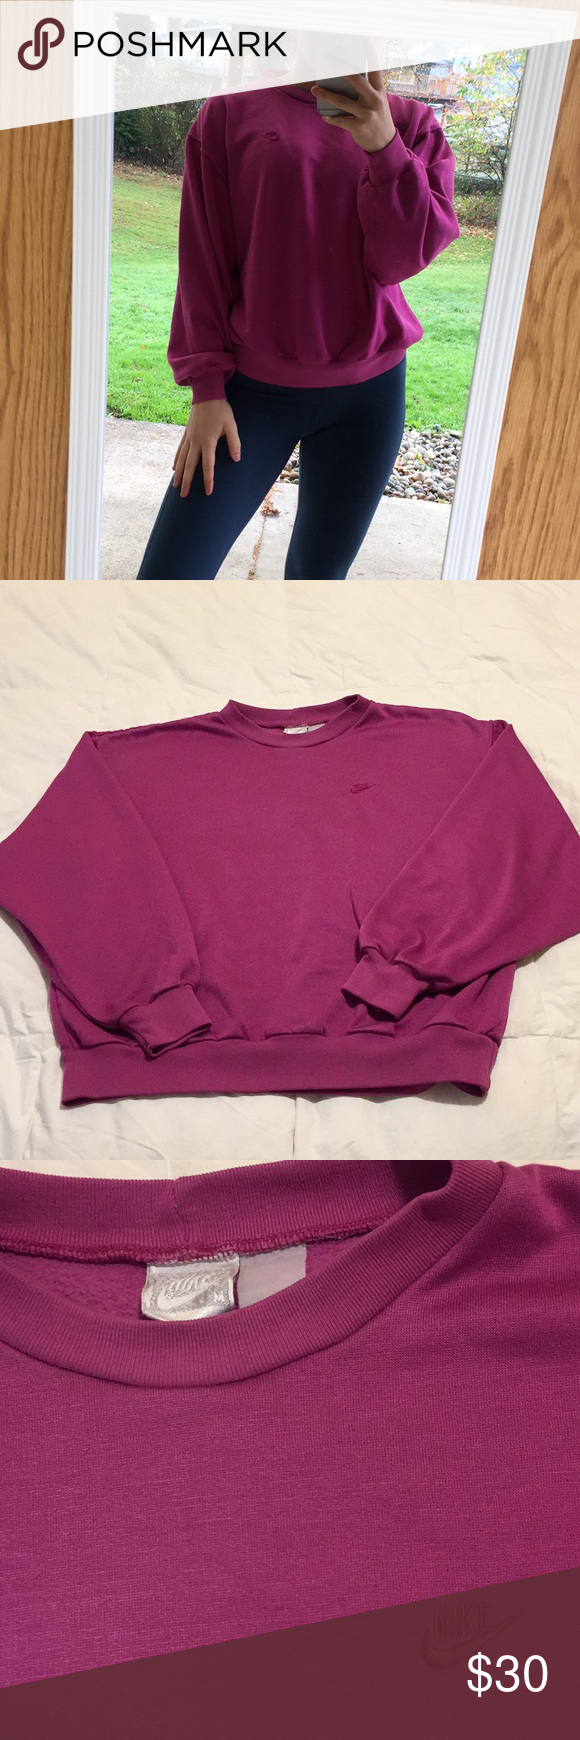 Nike Crewneck Sweatshirt Nike Crewneck Sweatshirt Sweatshirts Crew Neck Sweatshirt [ 1740 x 580 Pixel ]